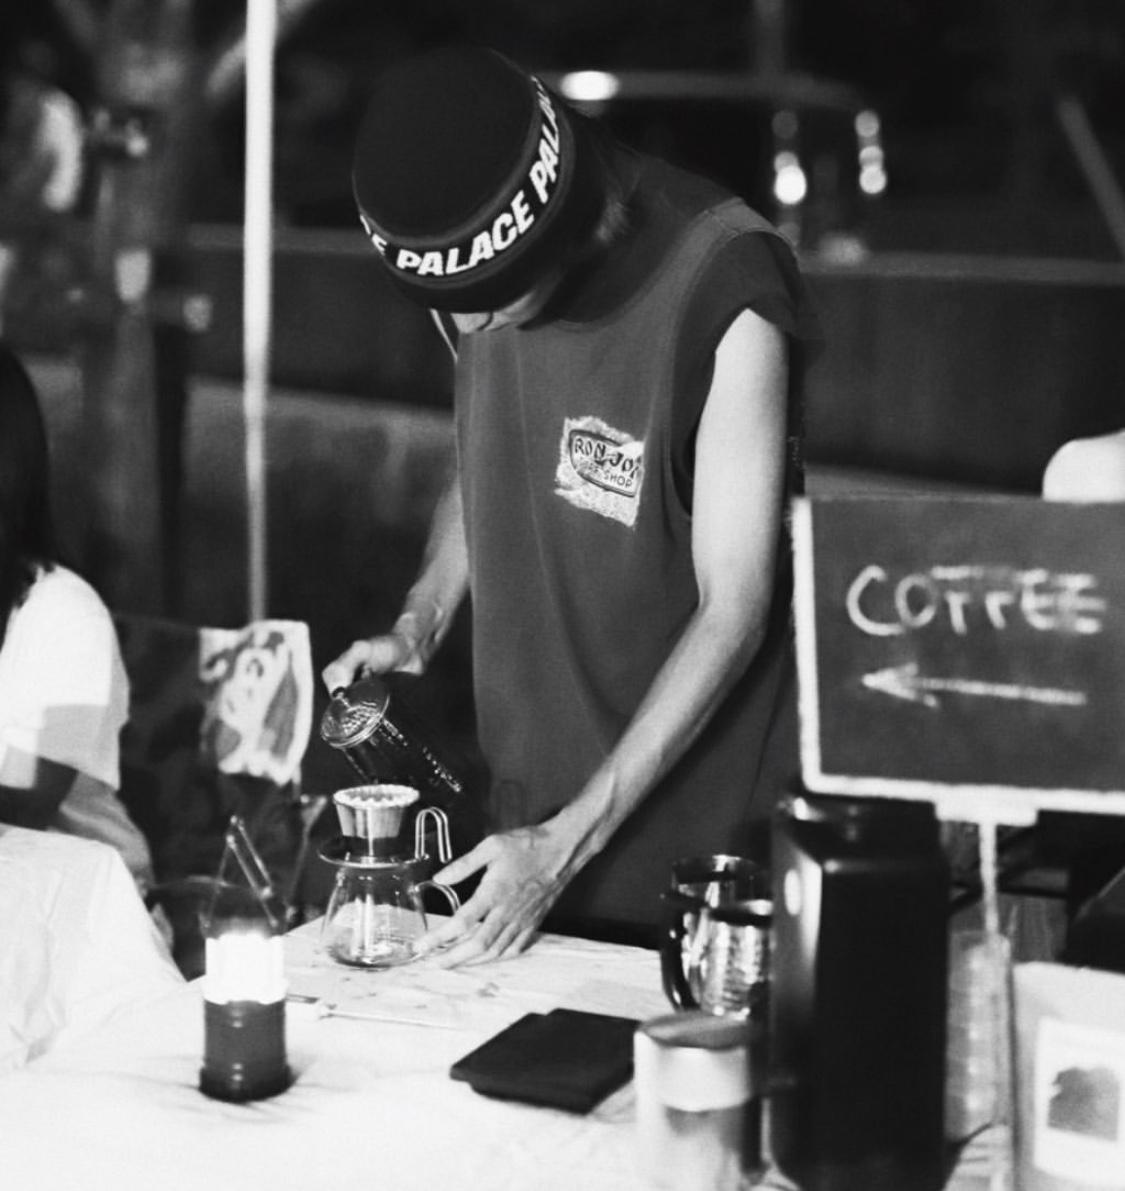 STRANGER COFFEEのプロフィール写真